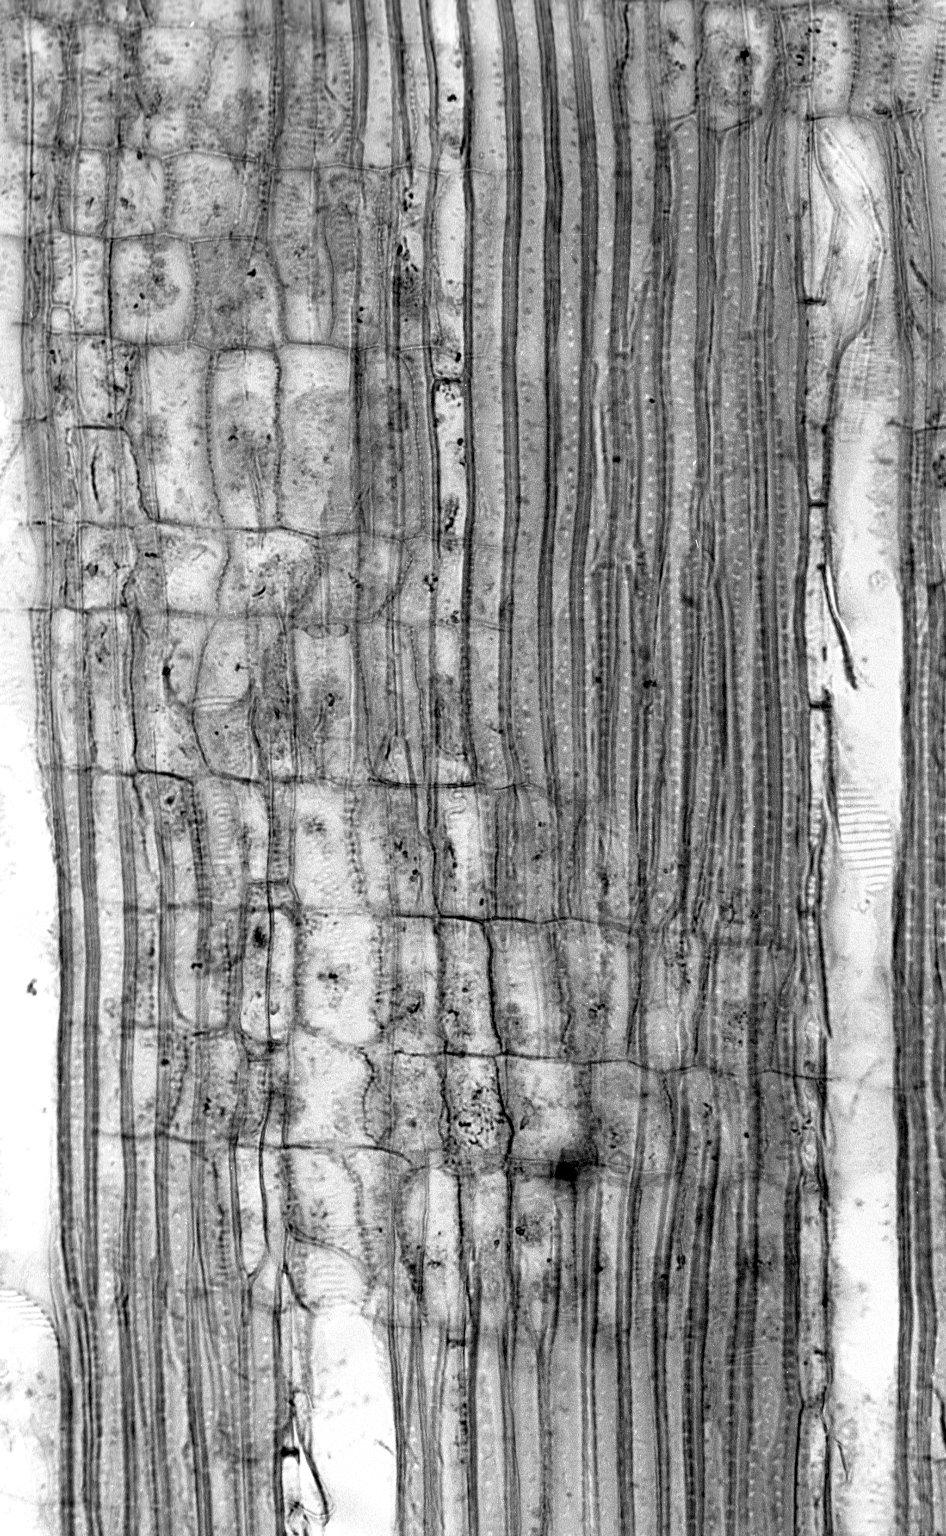 COLUMELLIACEAE Columellia oblonga